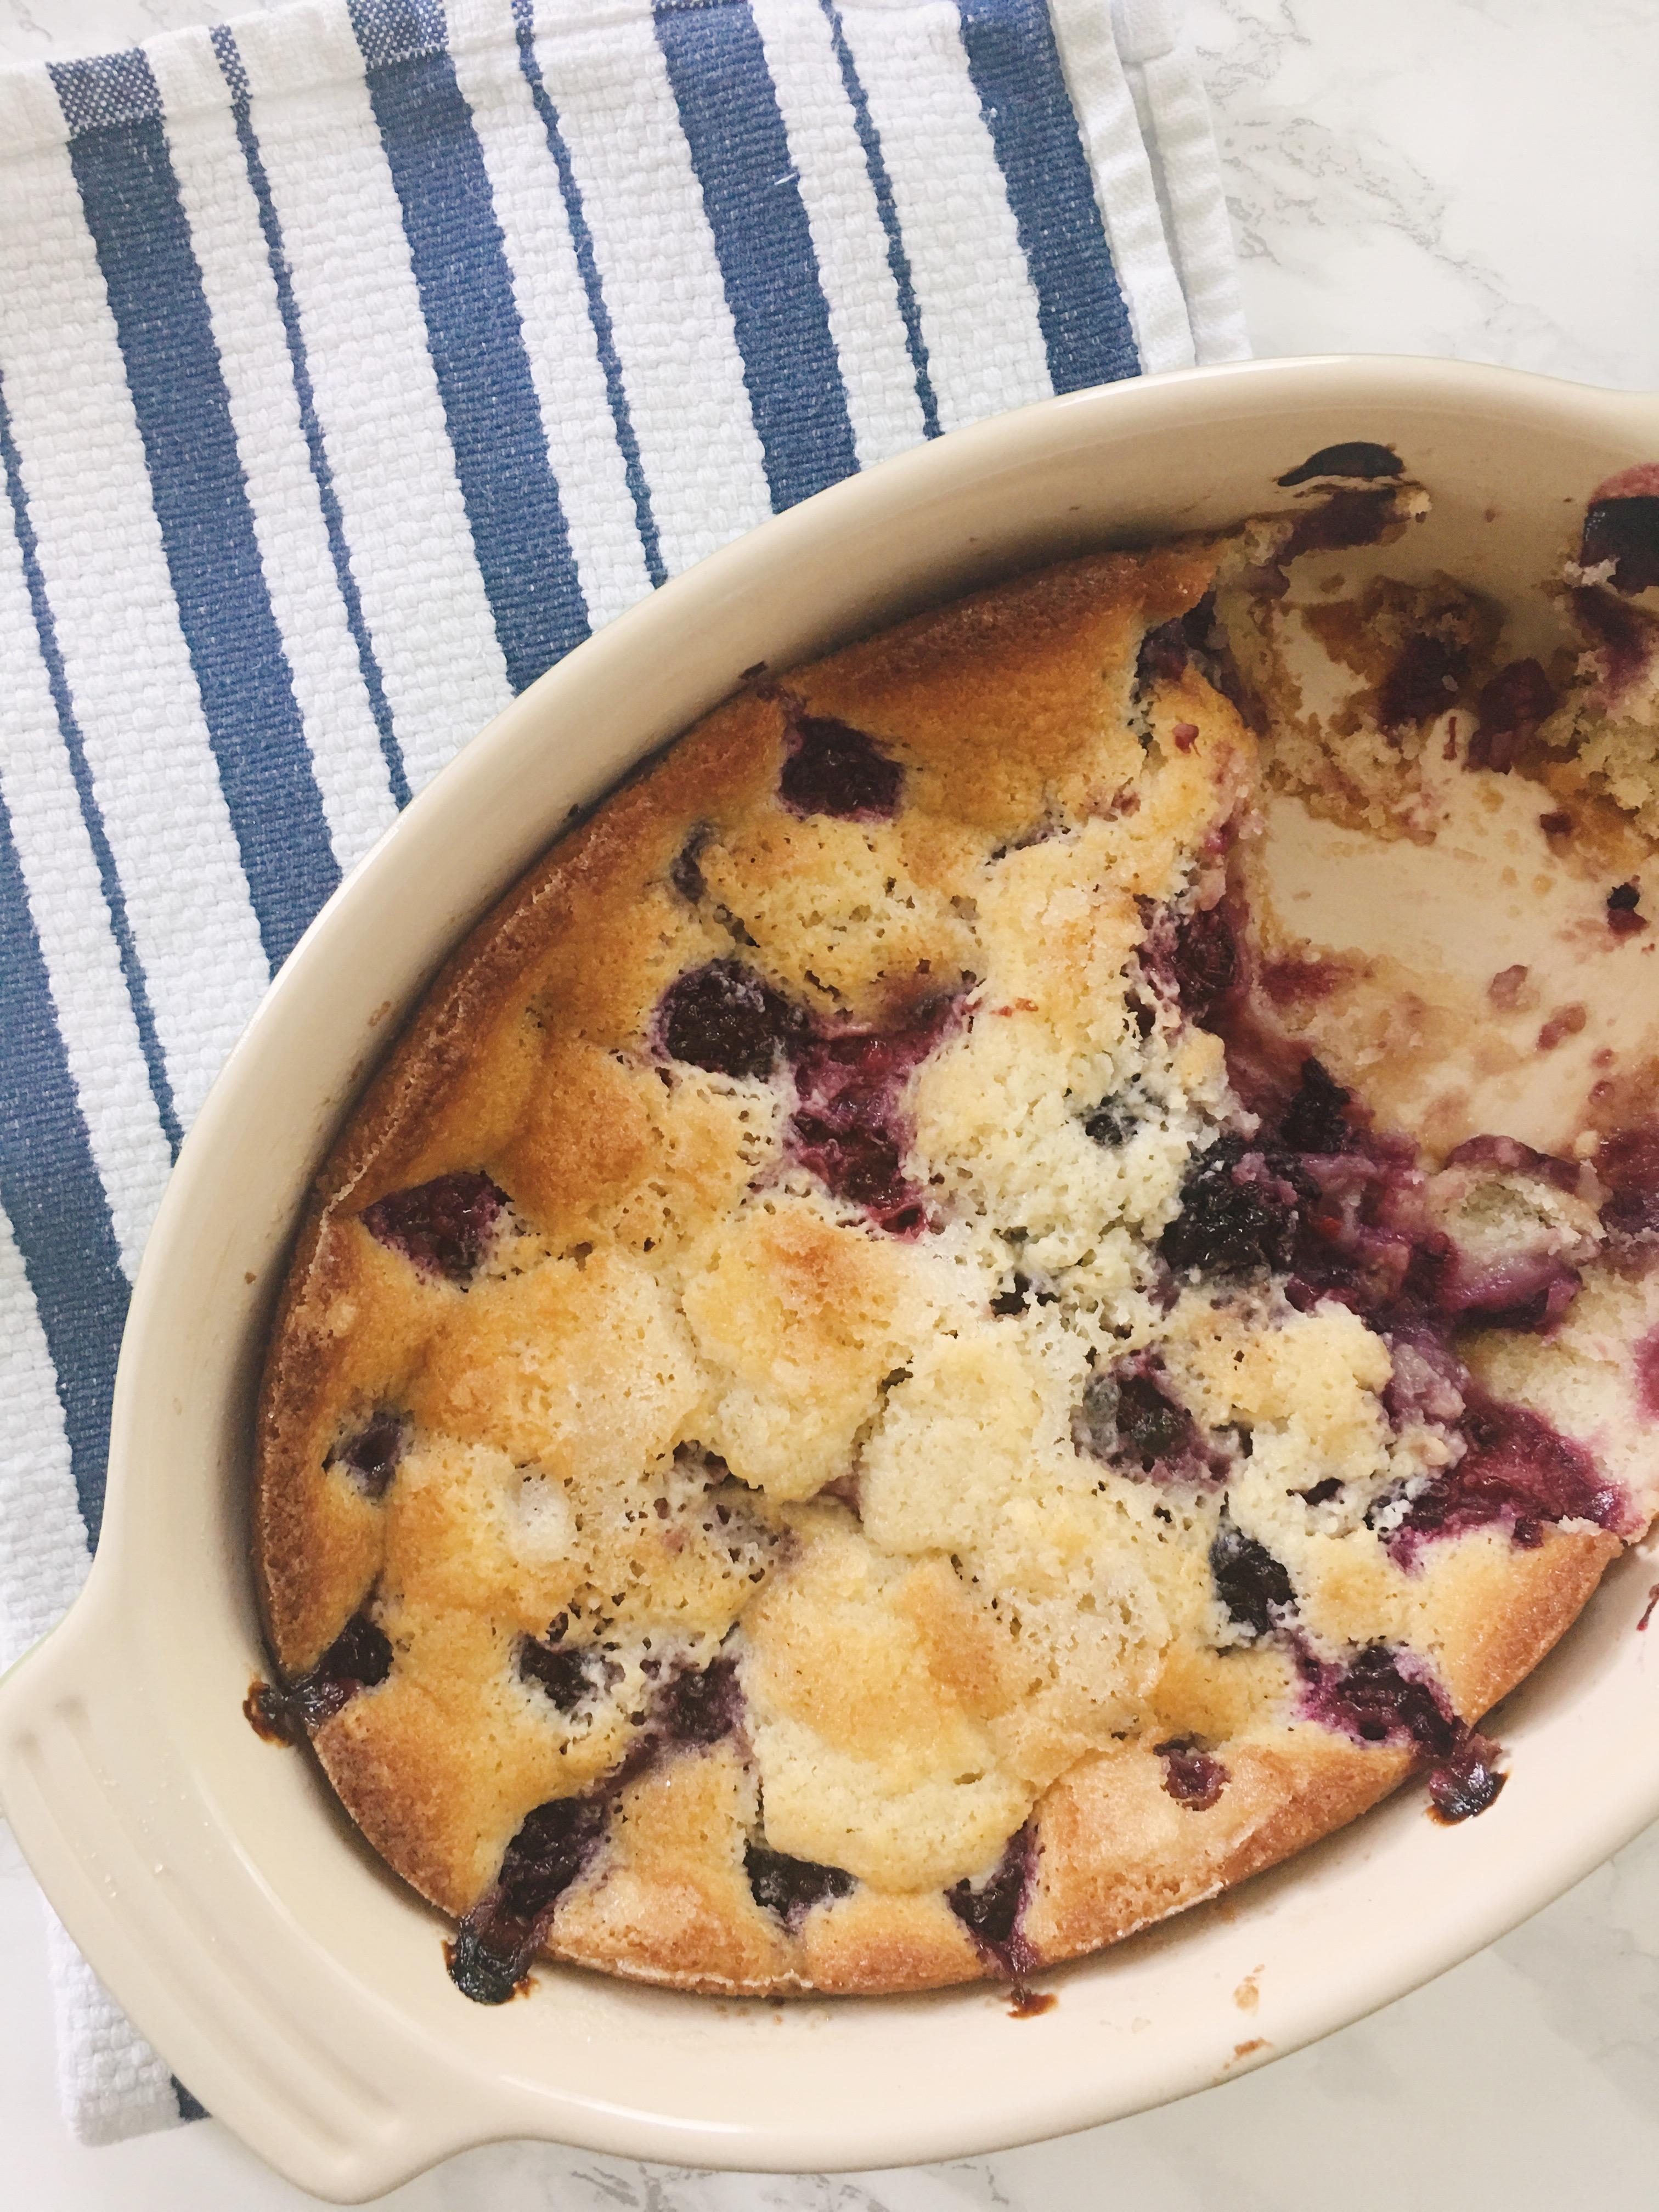 the pioneer woman's blackberry cobbler